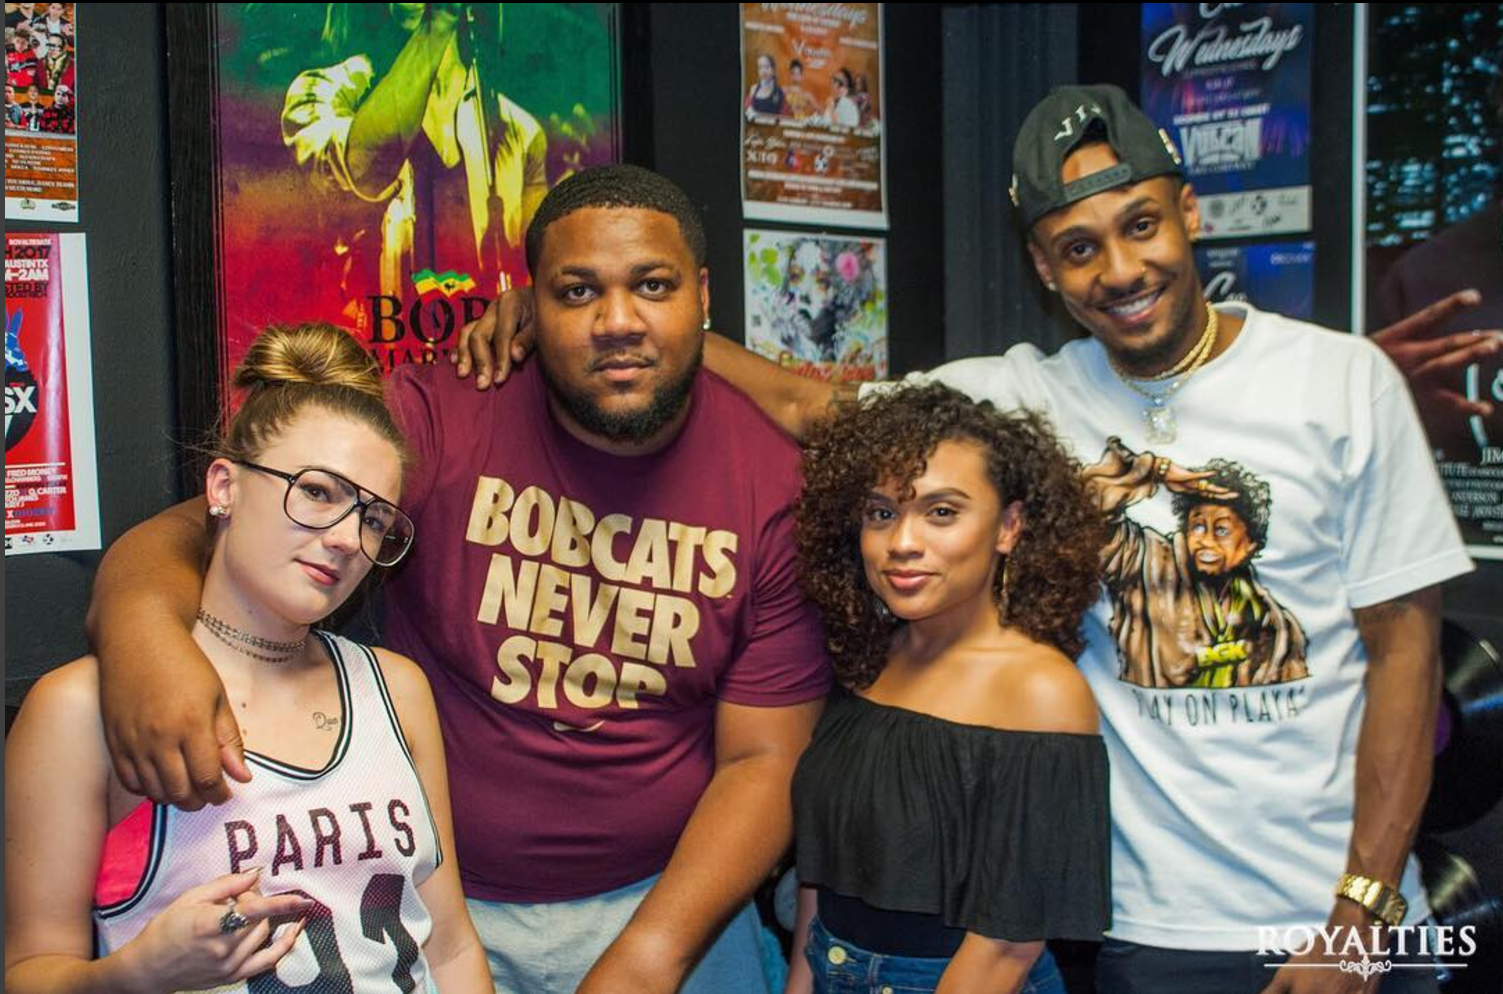 Royalties Radio Show Team